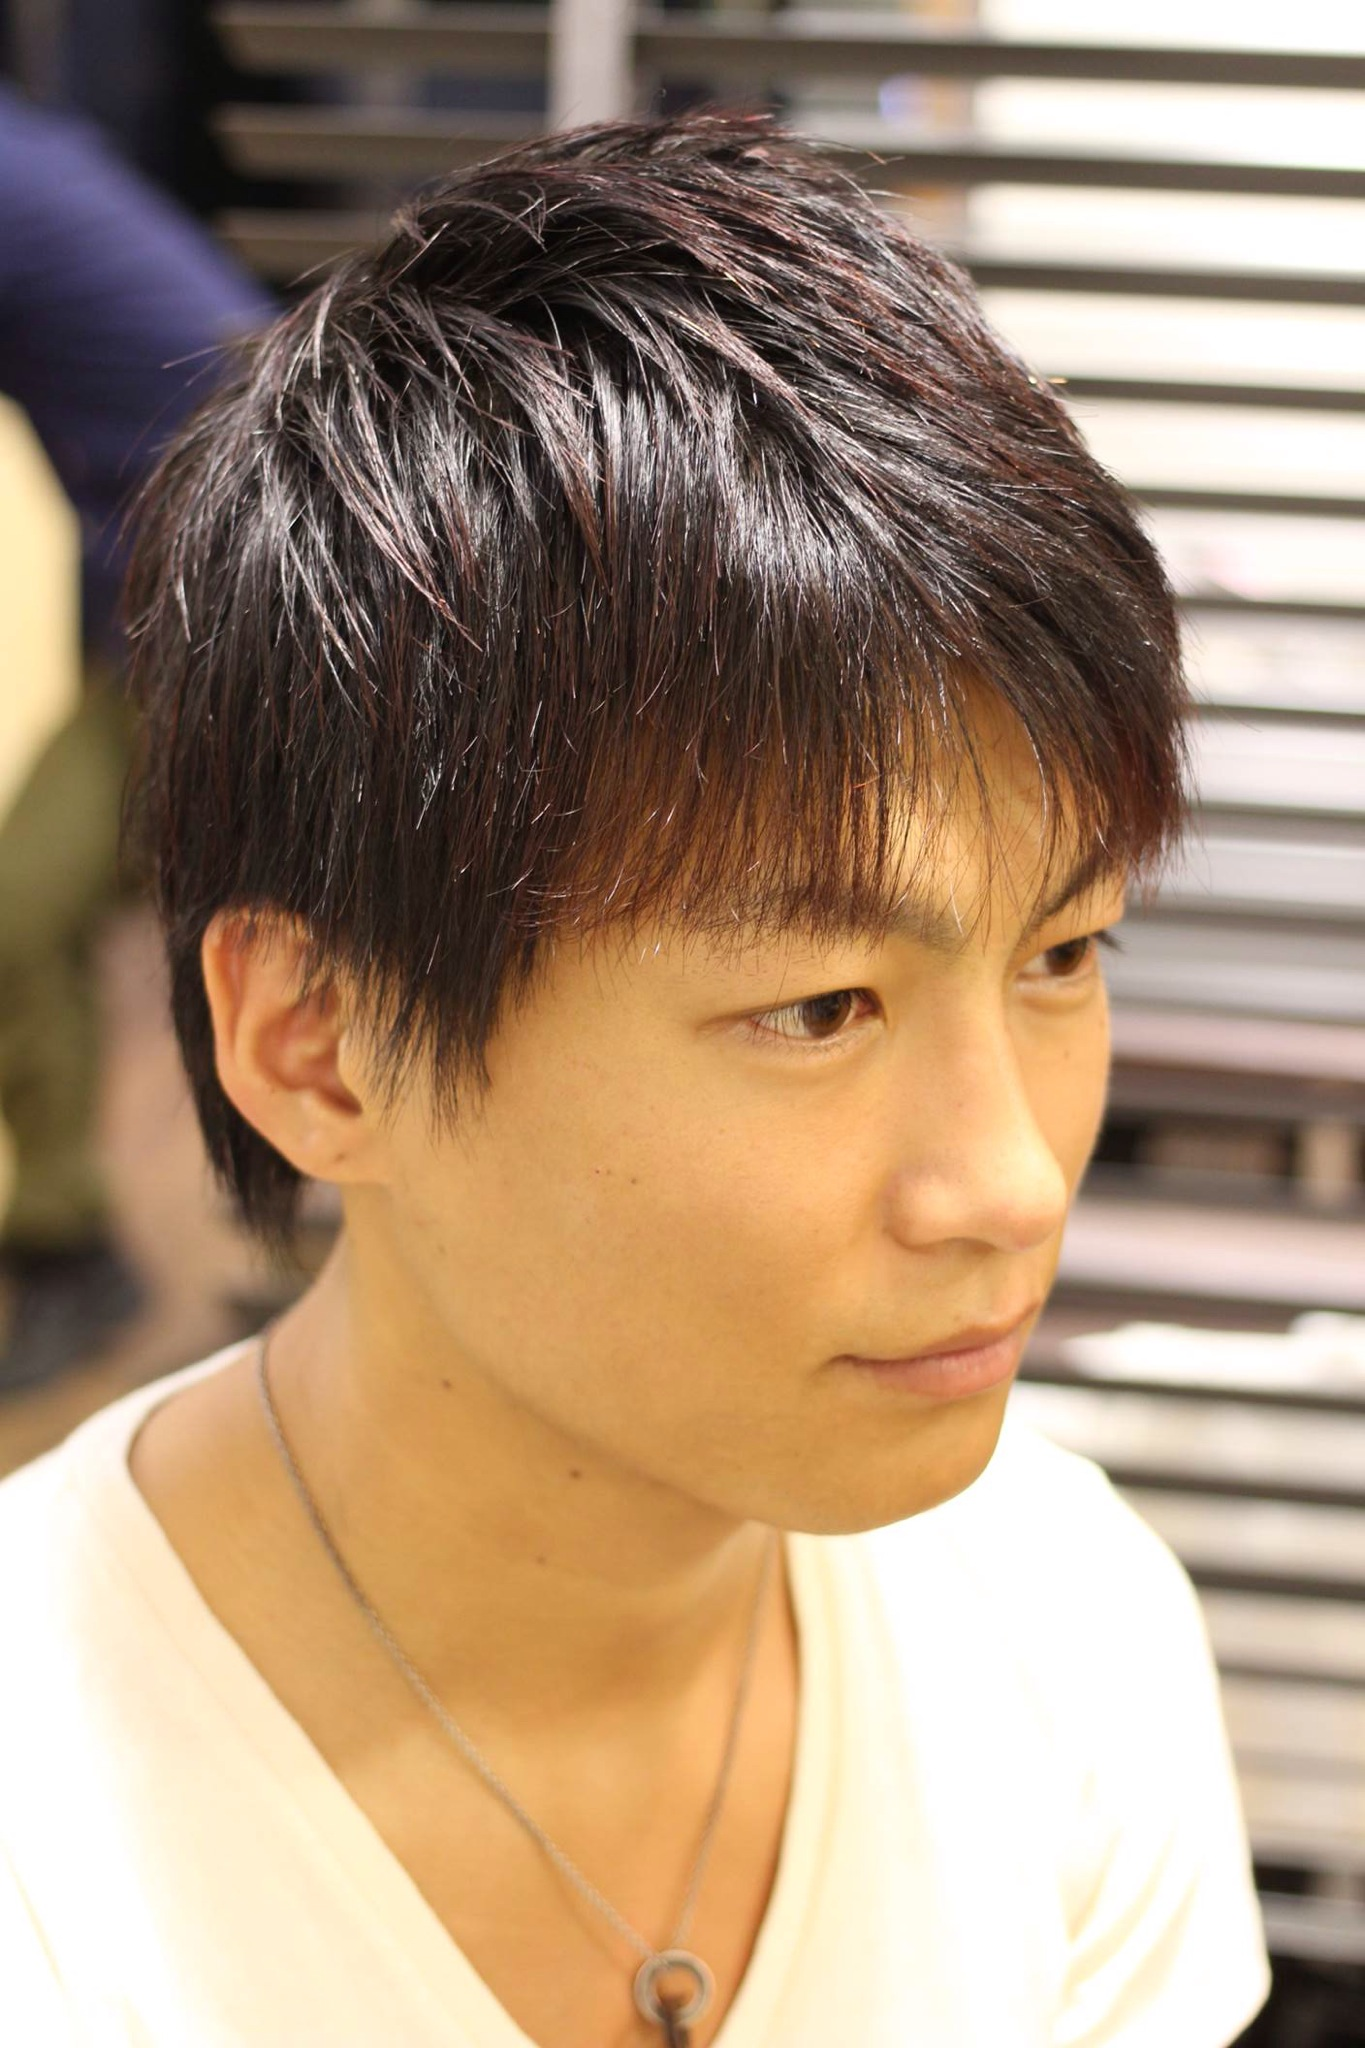 IMG_8322-0.JPG